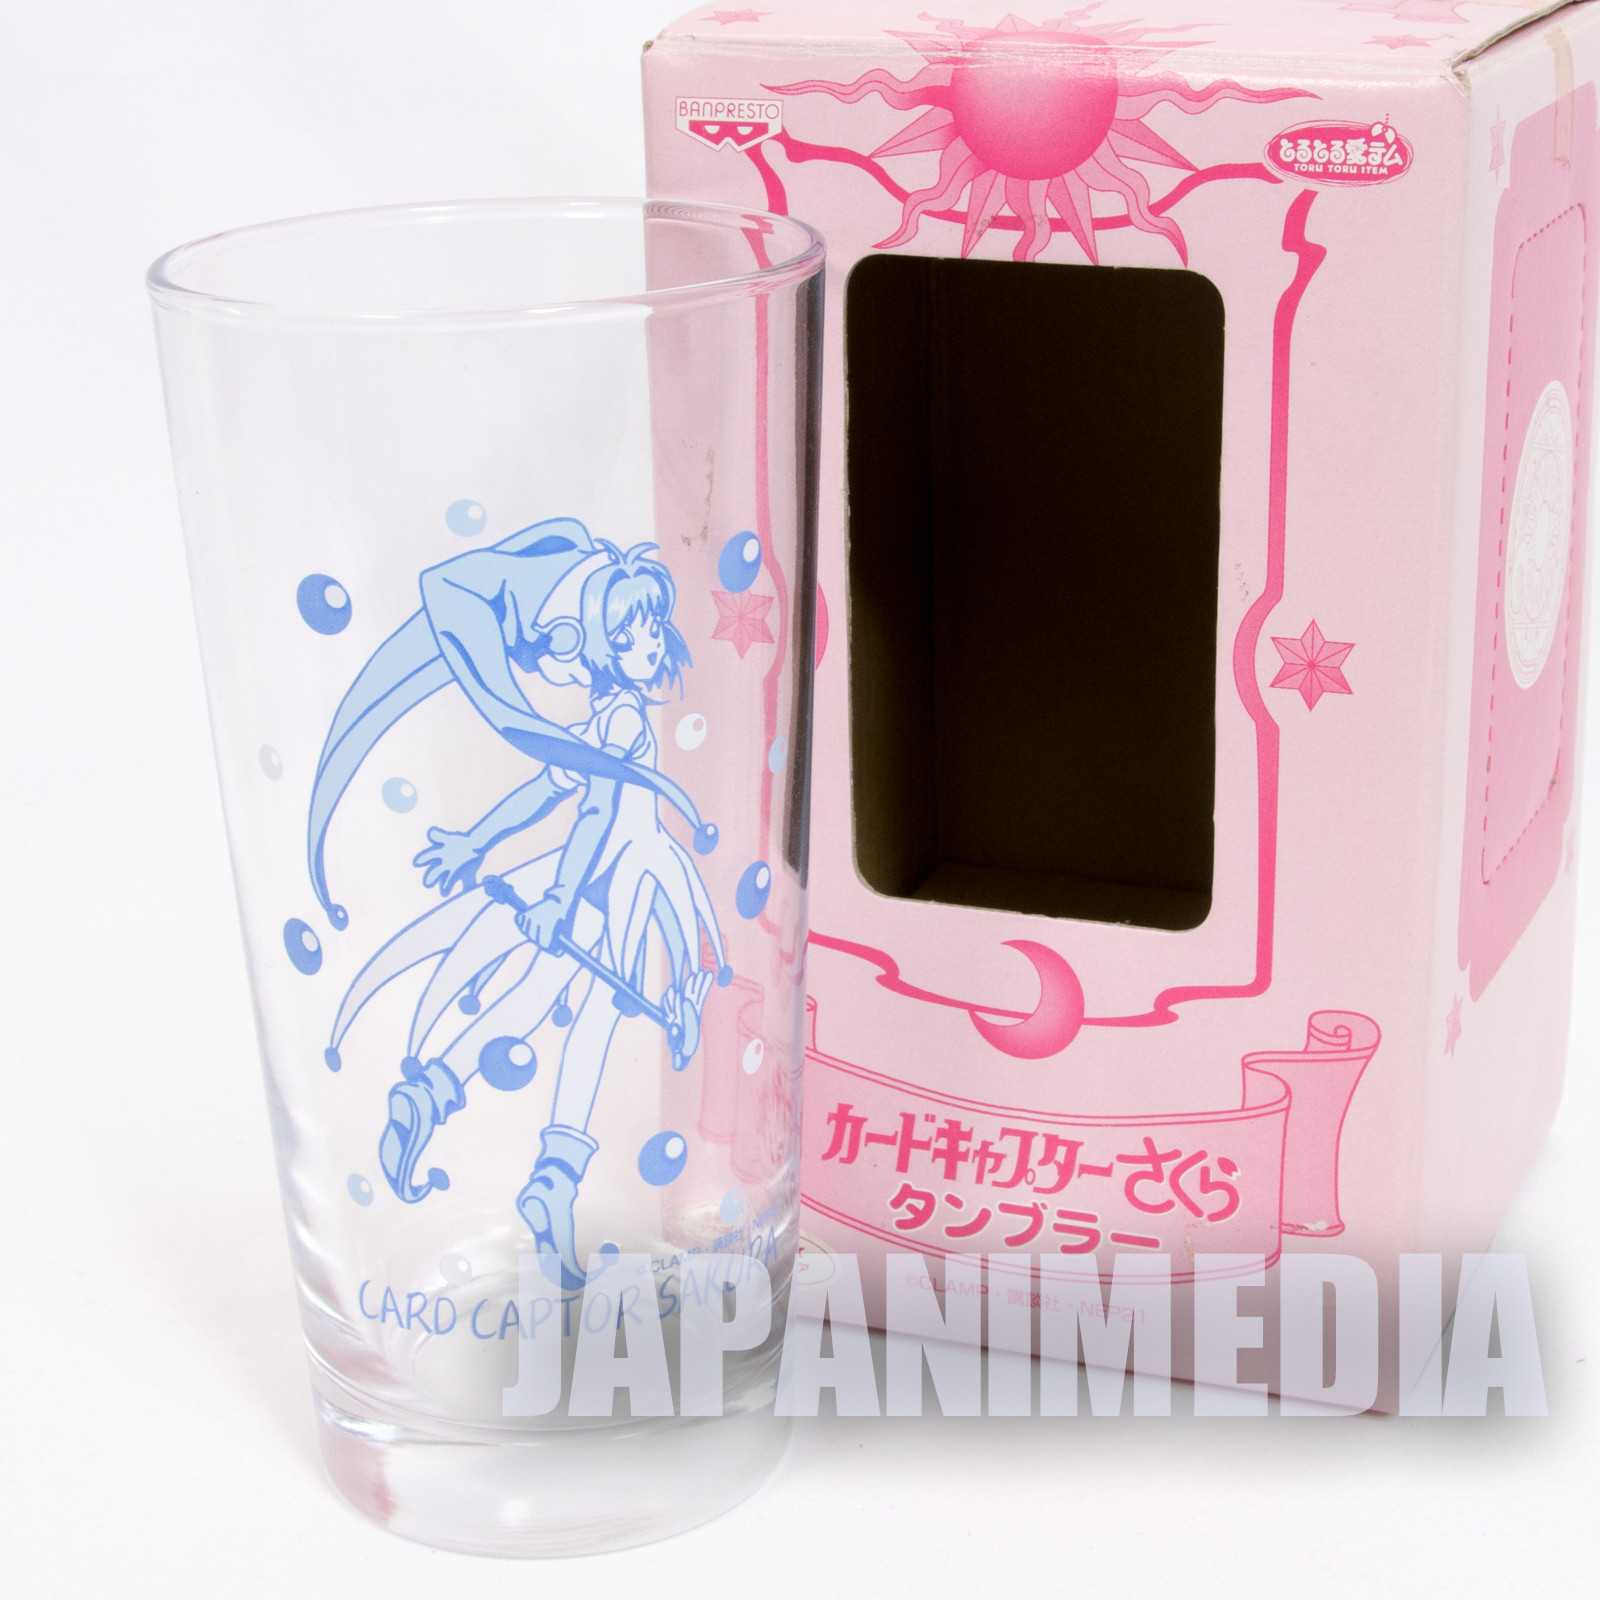 Cardcaptor Sakura Tall Glass Blue Banpresto CLAMP JAPAN ANIME MANGA